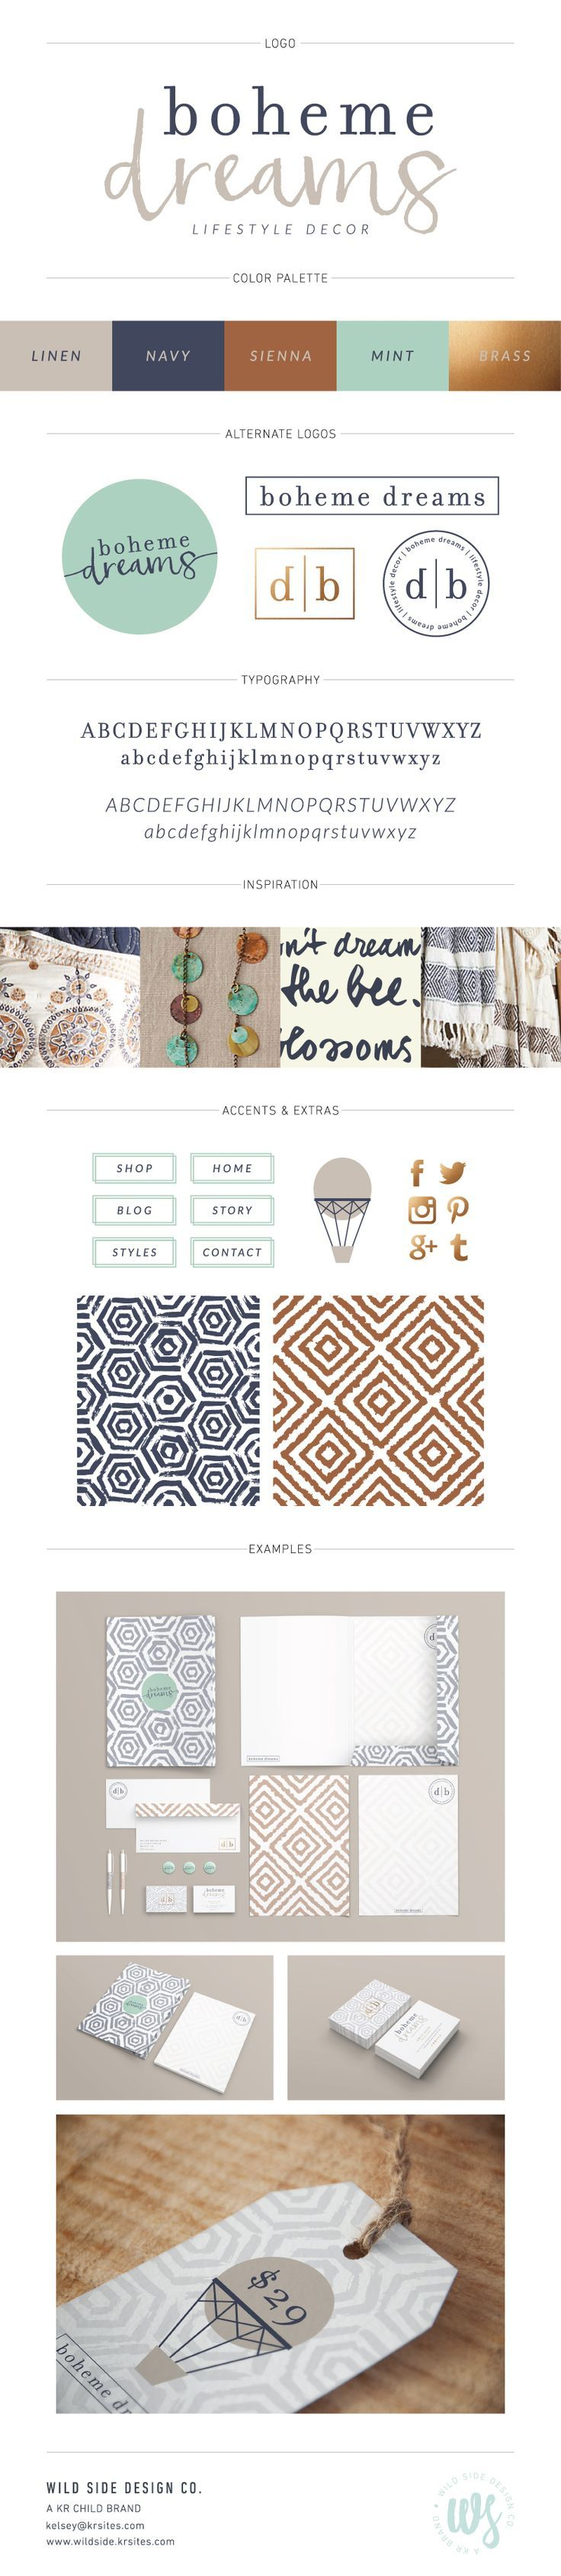 Brand Launch | Brand Style Board | Boho Home Decor Branding | Boheme Dreams Brand Design by Wild Side Design Co. |